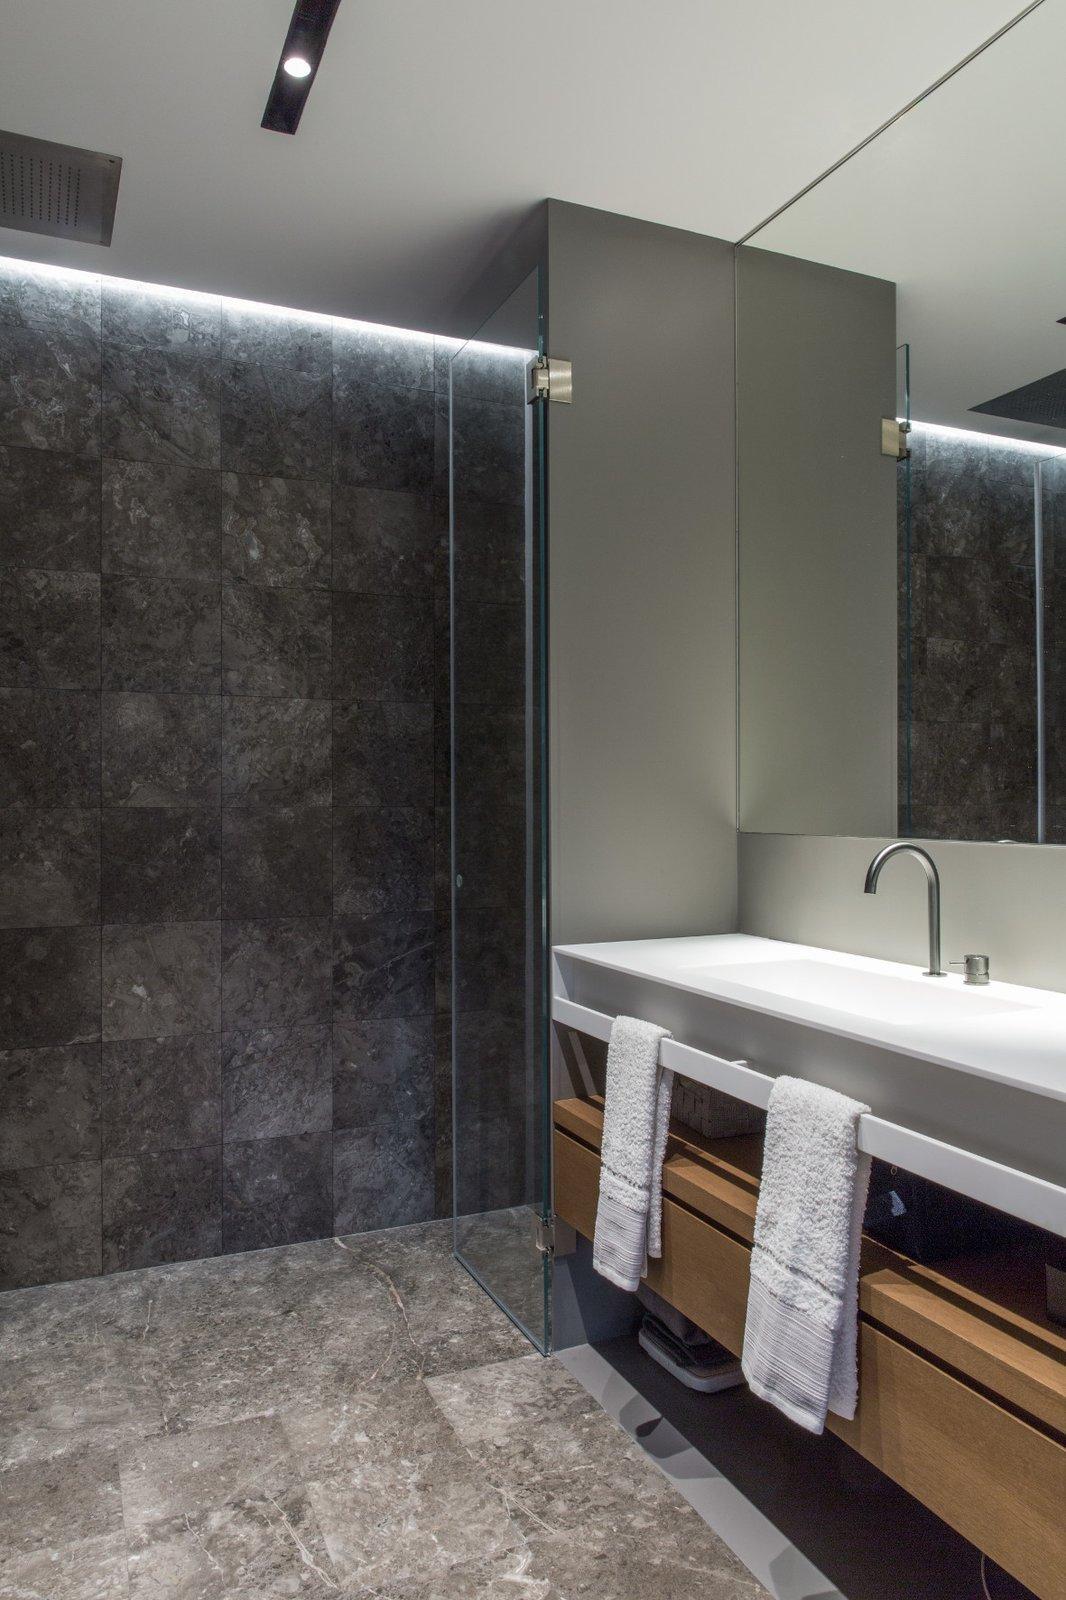 Bath Room, Ceiling Lighting, Marble Floor, Vessel Sink, and Marble Wall Bathroom  House A326